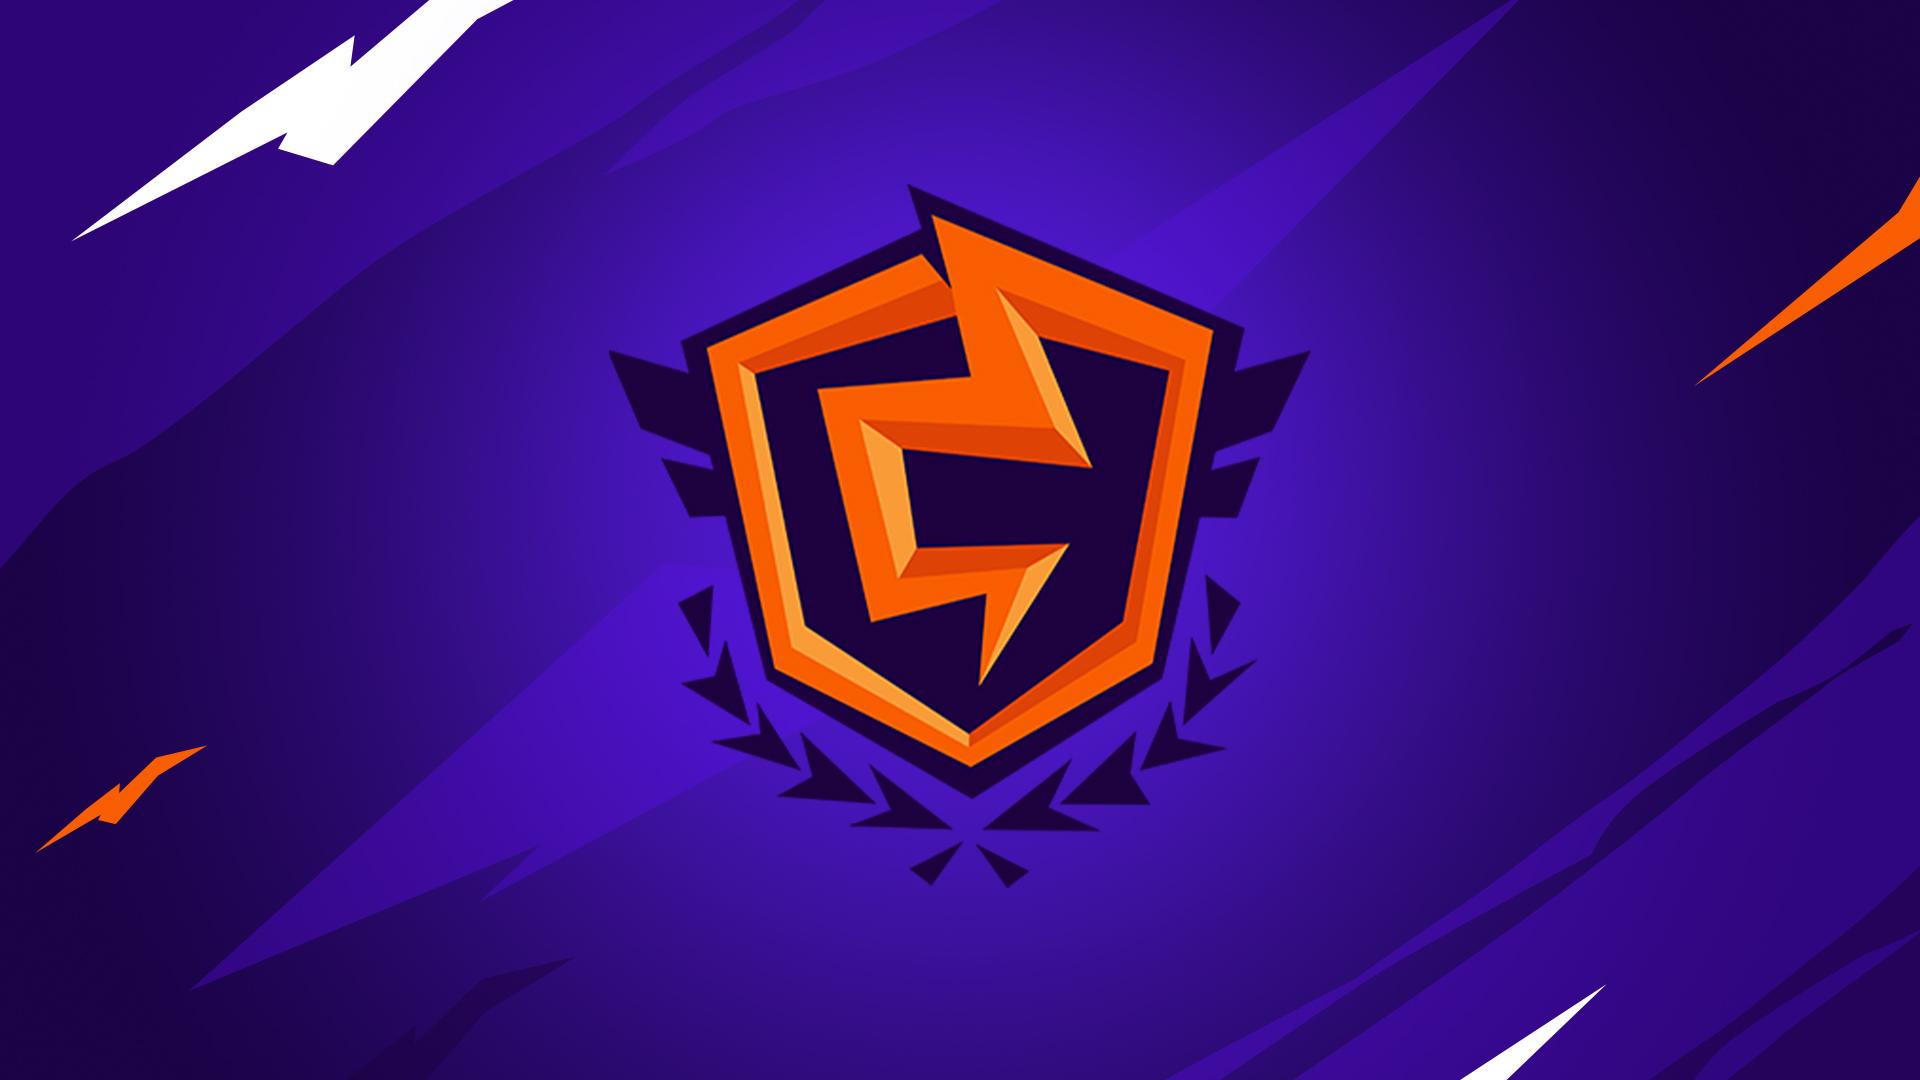 FNCS Season 6 icon